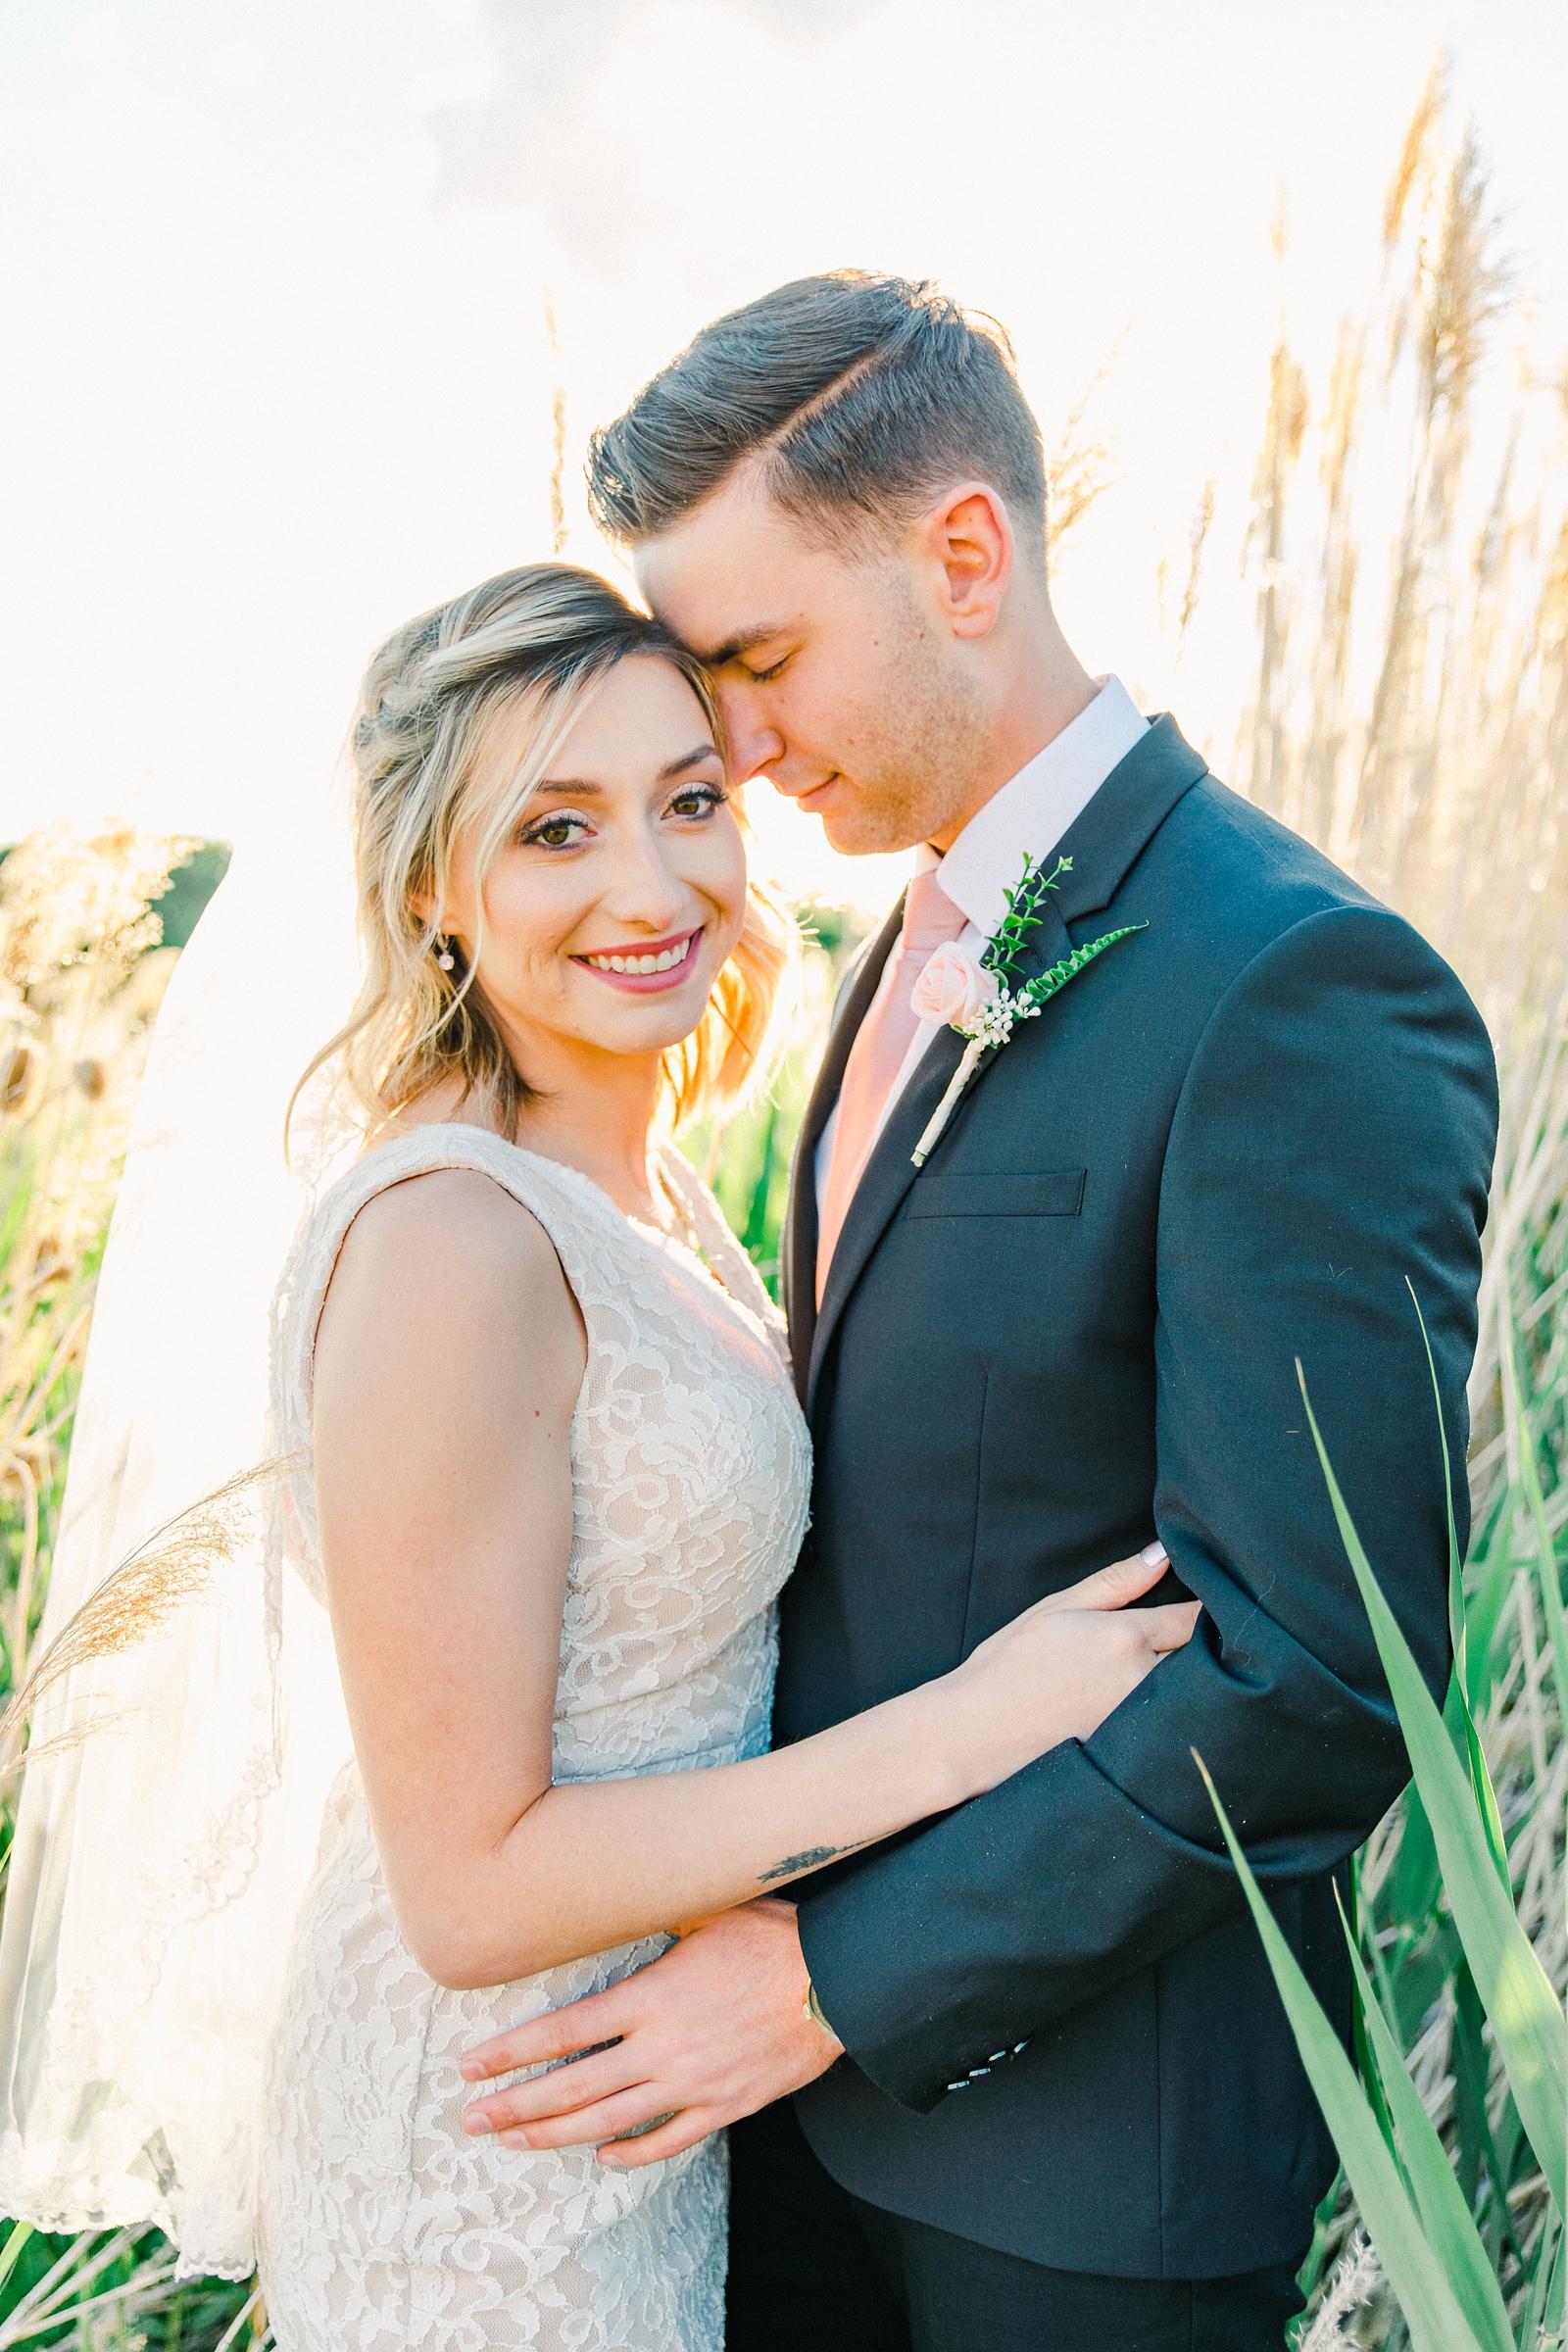 Salt Lake City Utah Bridal Wedding Photography, Tunnel Springs Park, bride and groom in long grasses cattails golden sunset light